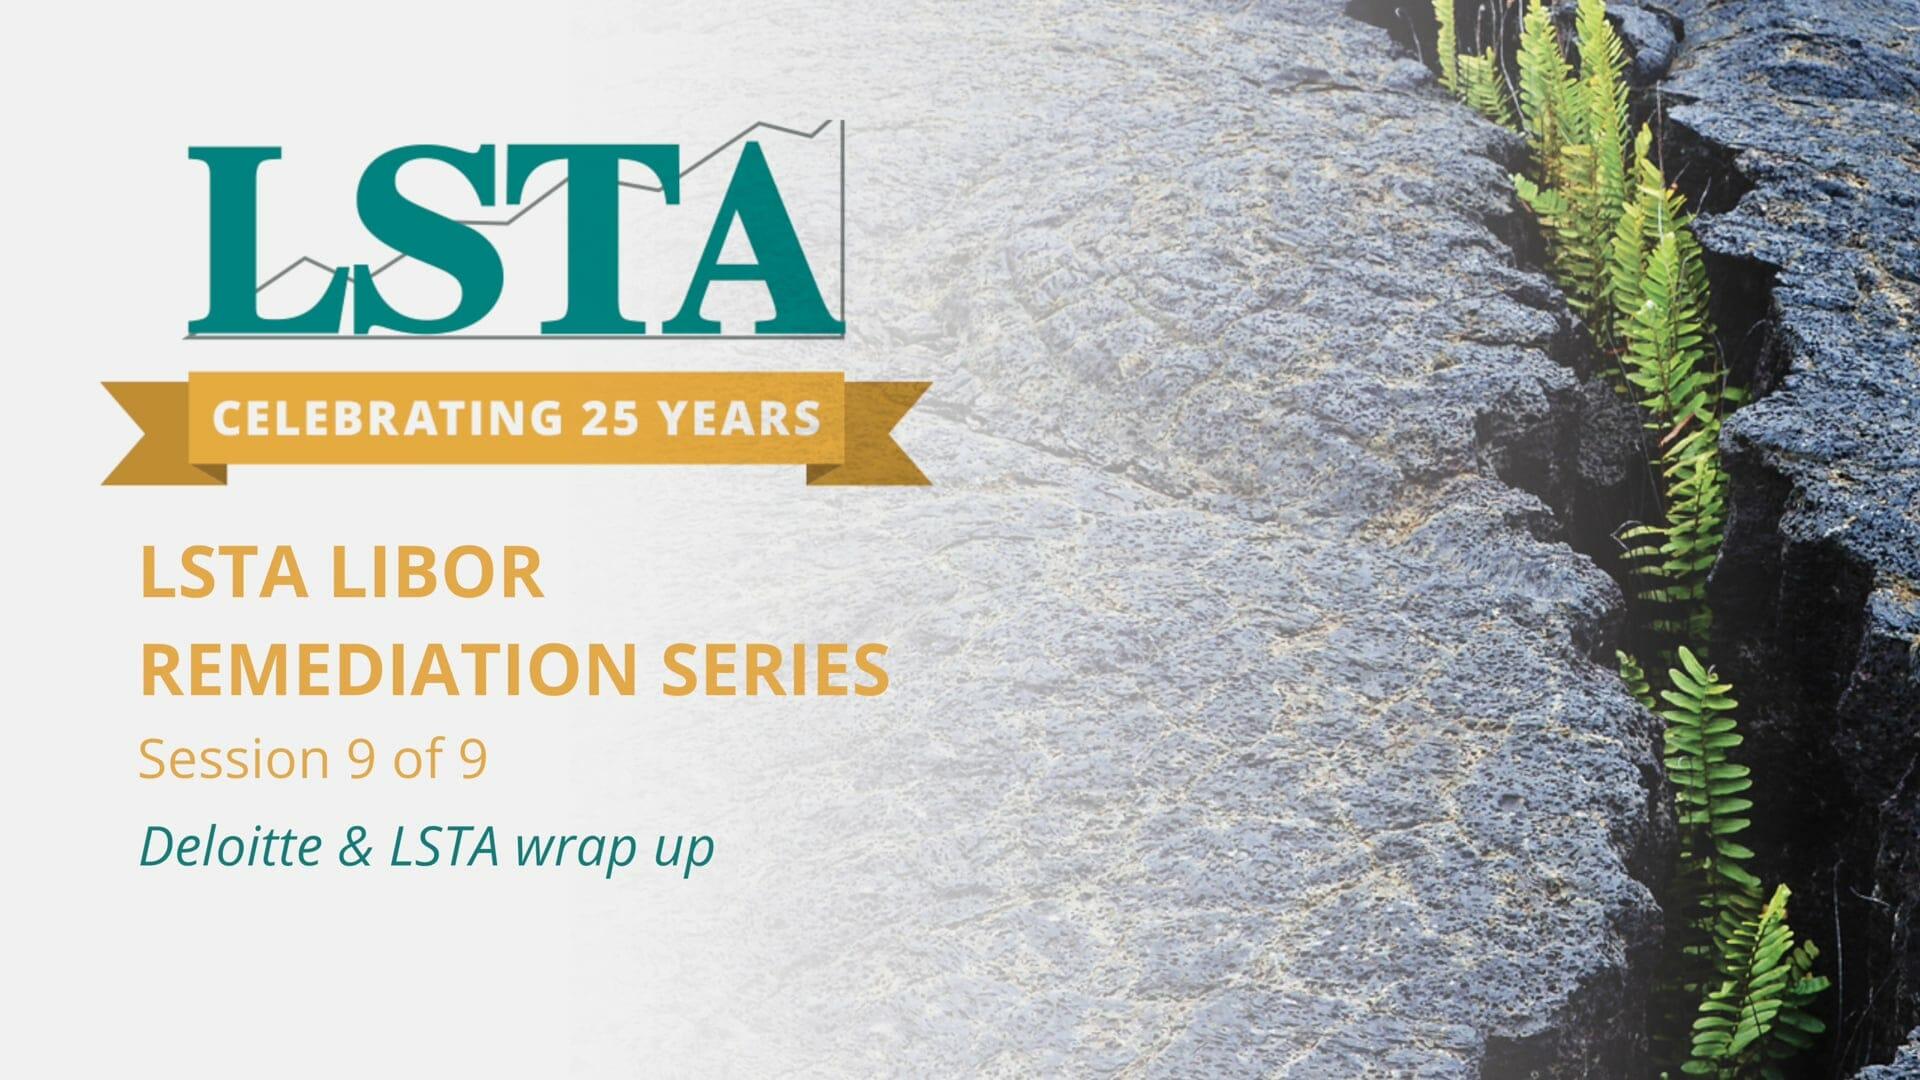 LSTA LIBOR Remediation Series Video – Deloitte & Wrap Up